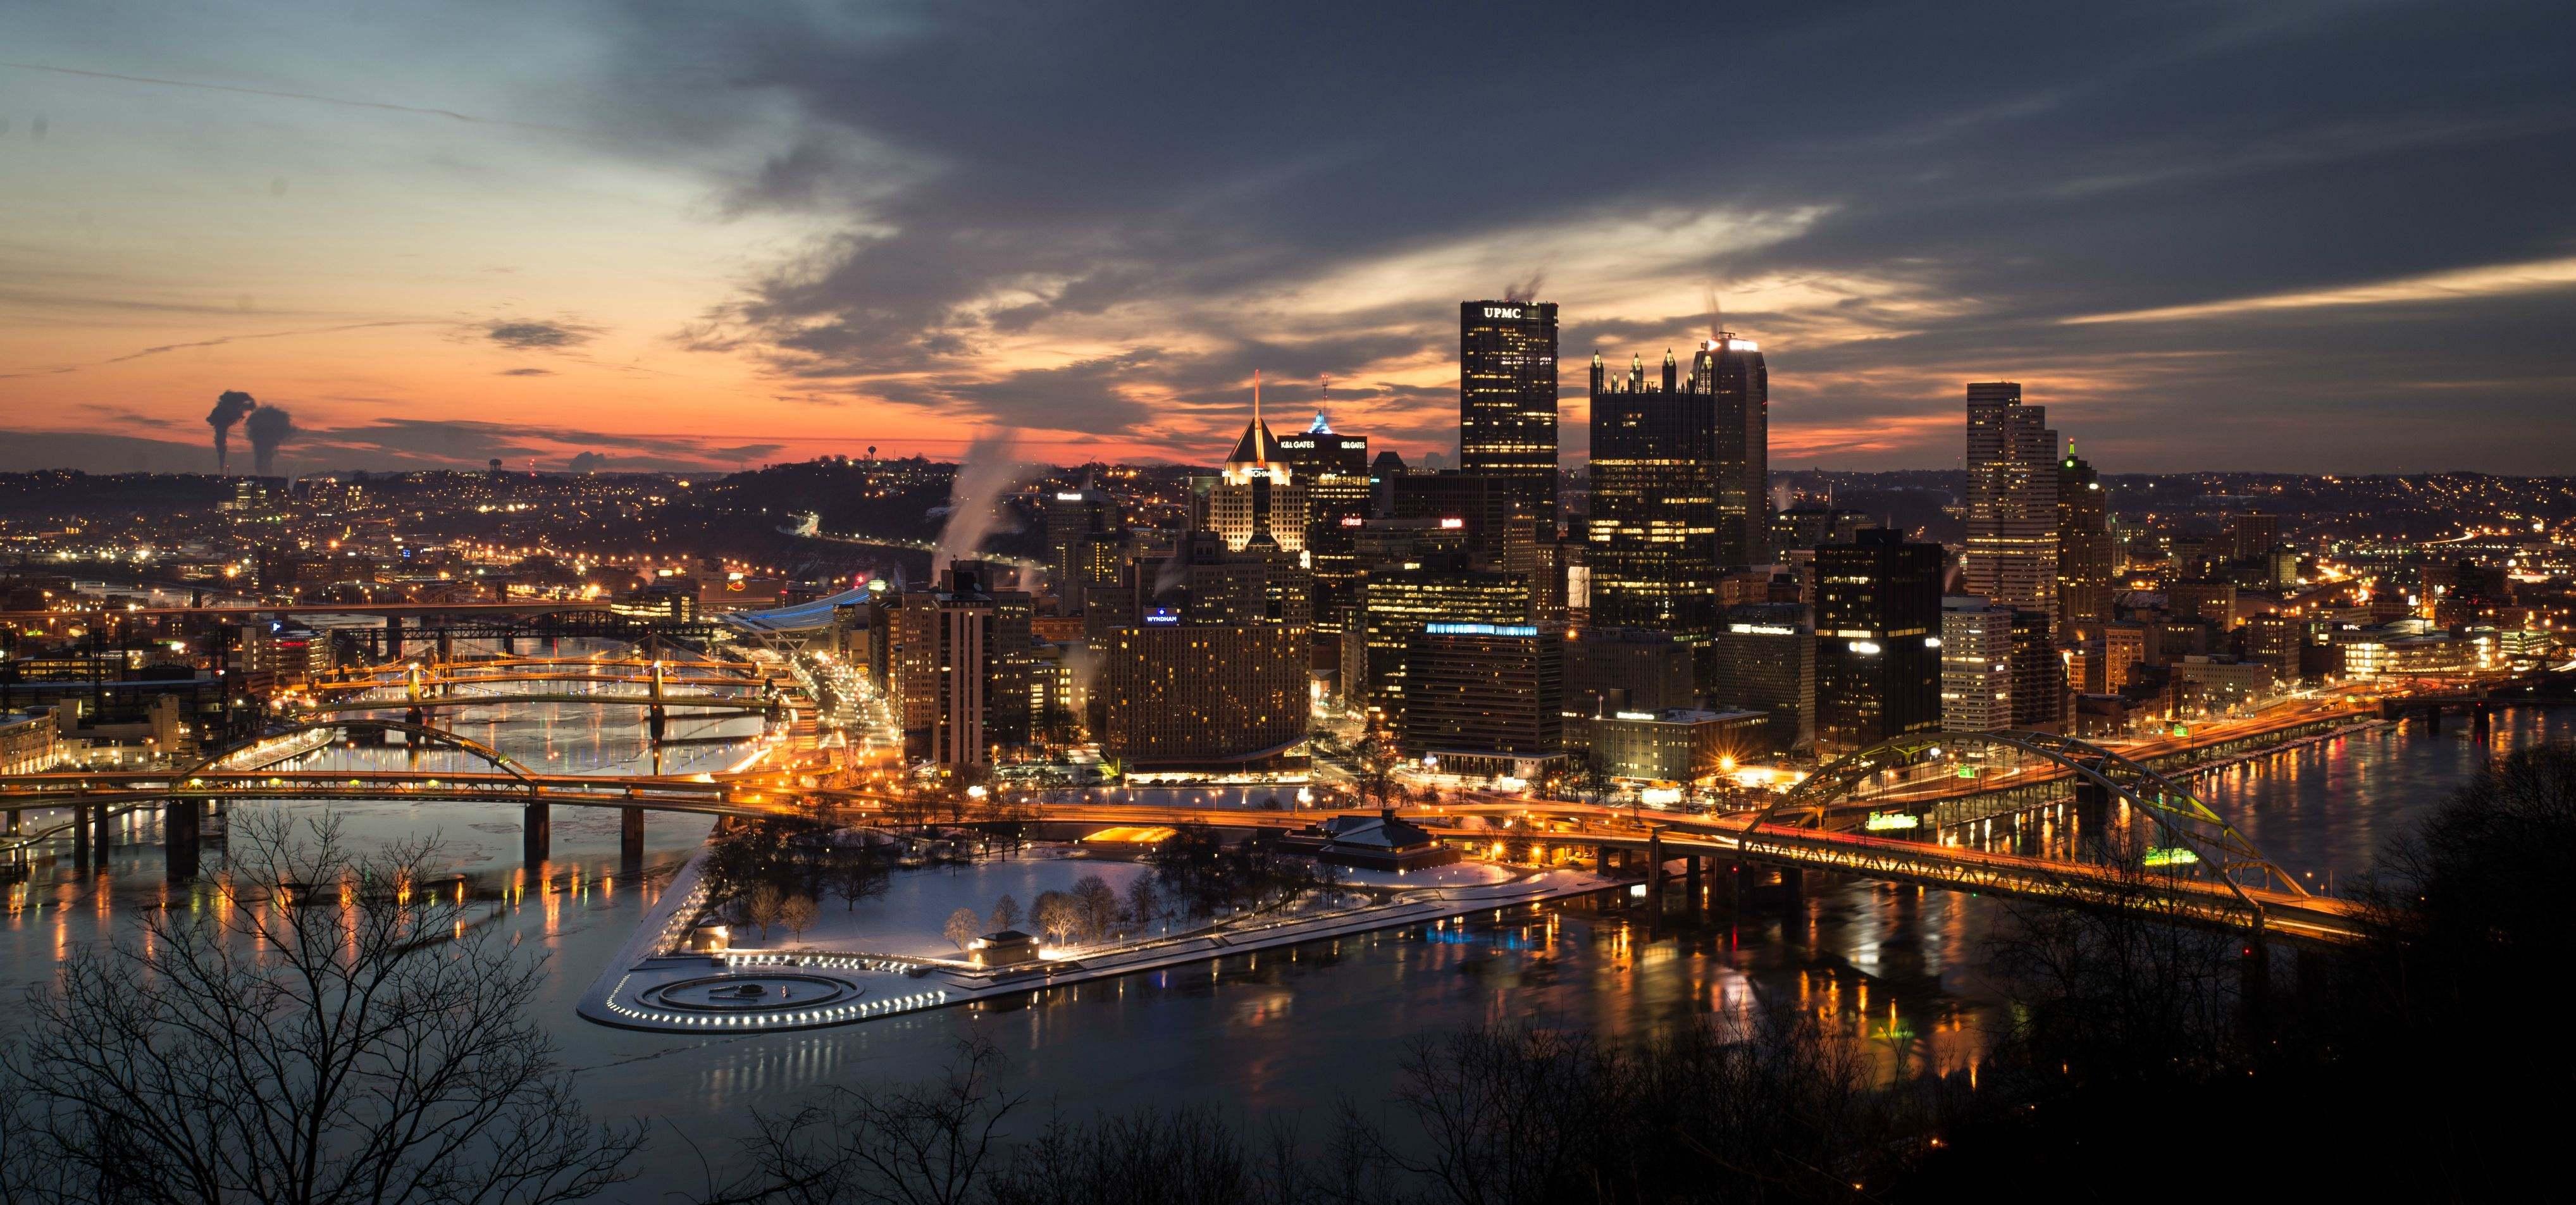 Pittsburgh Desktop Wallpaper Skyline: Pittsburgh City Wallpapers